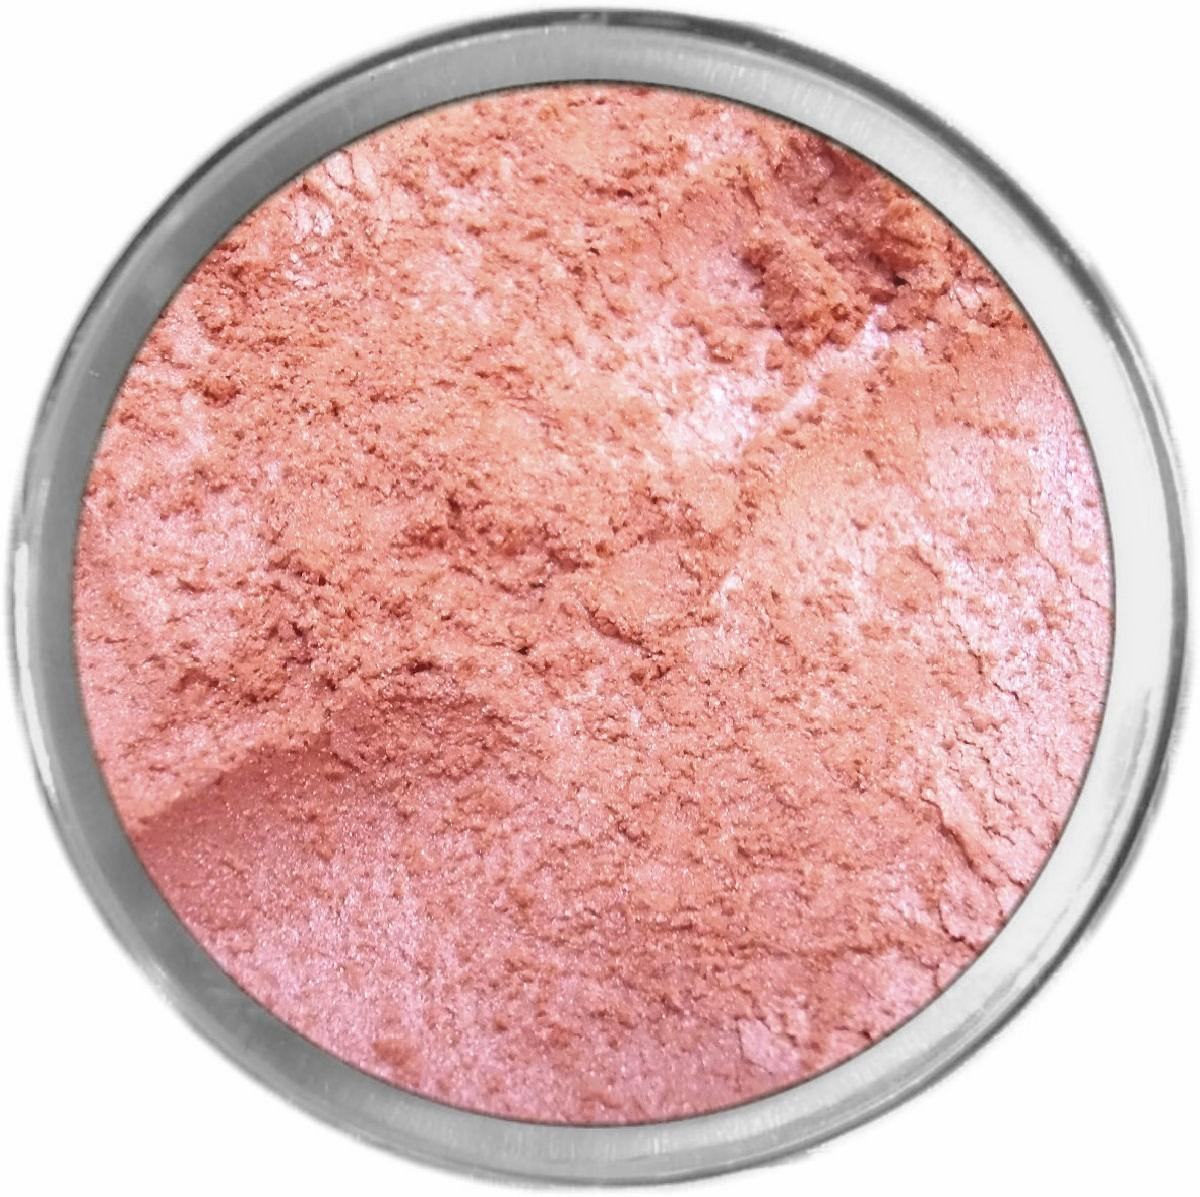 AURORA loose powder mineral multi-use color makeup bare earth pigment minerals